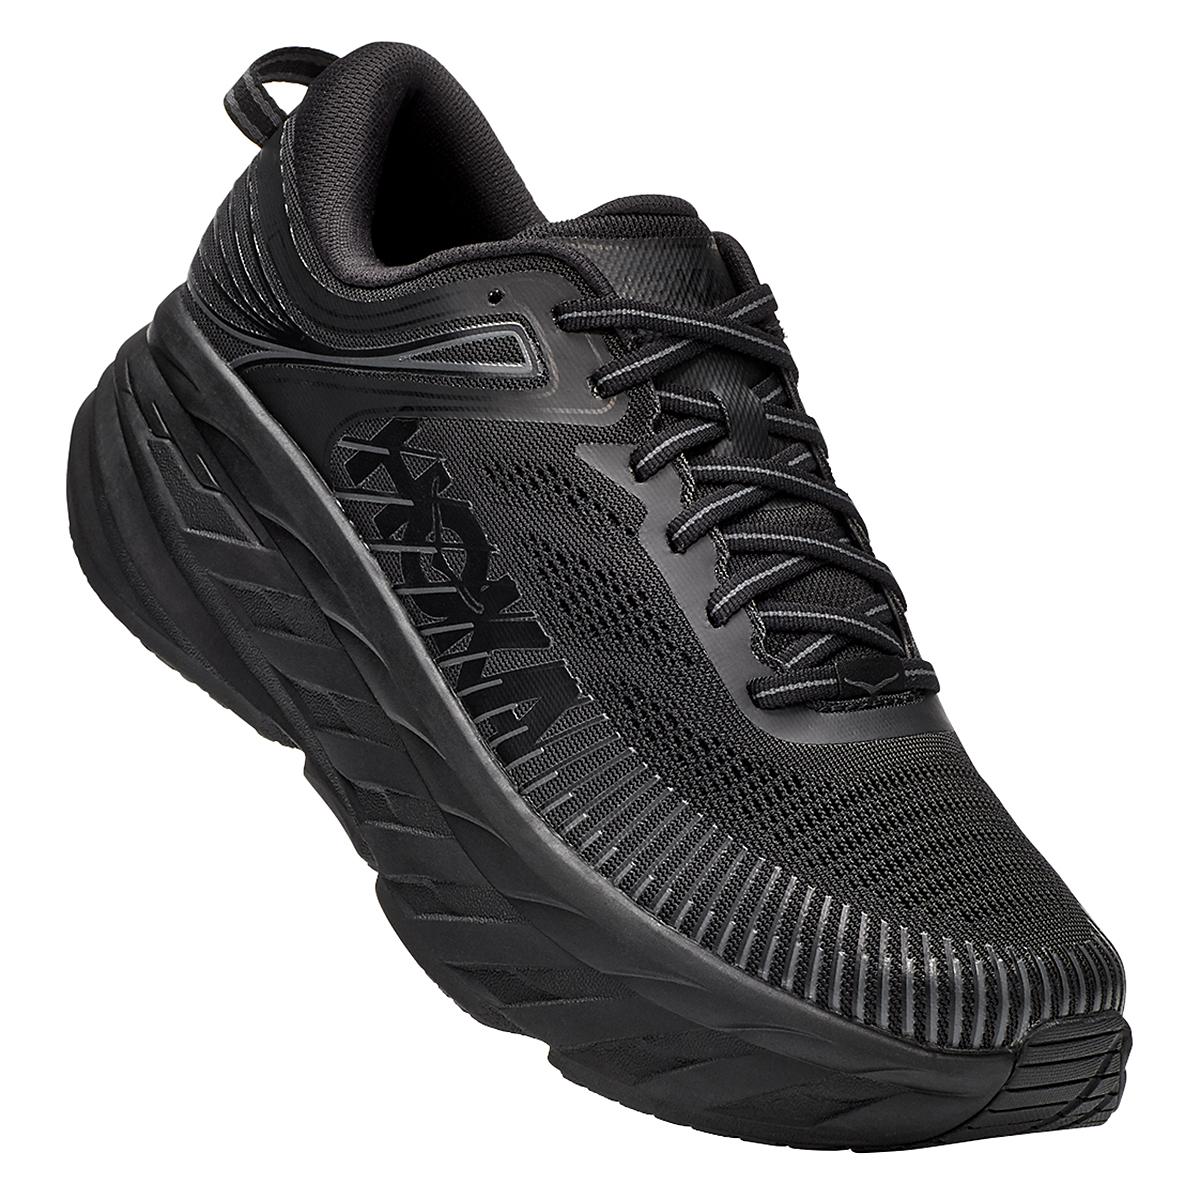 Men's Hoka One One Bondi 7 Running Shoe - Color: Black - Size: 7.5 - Width: Regular, Black, large, image 2